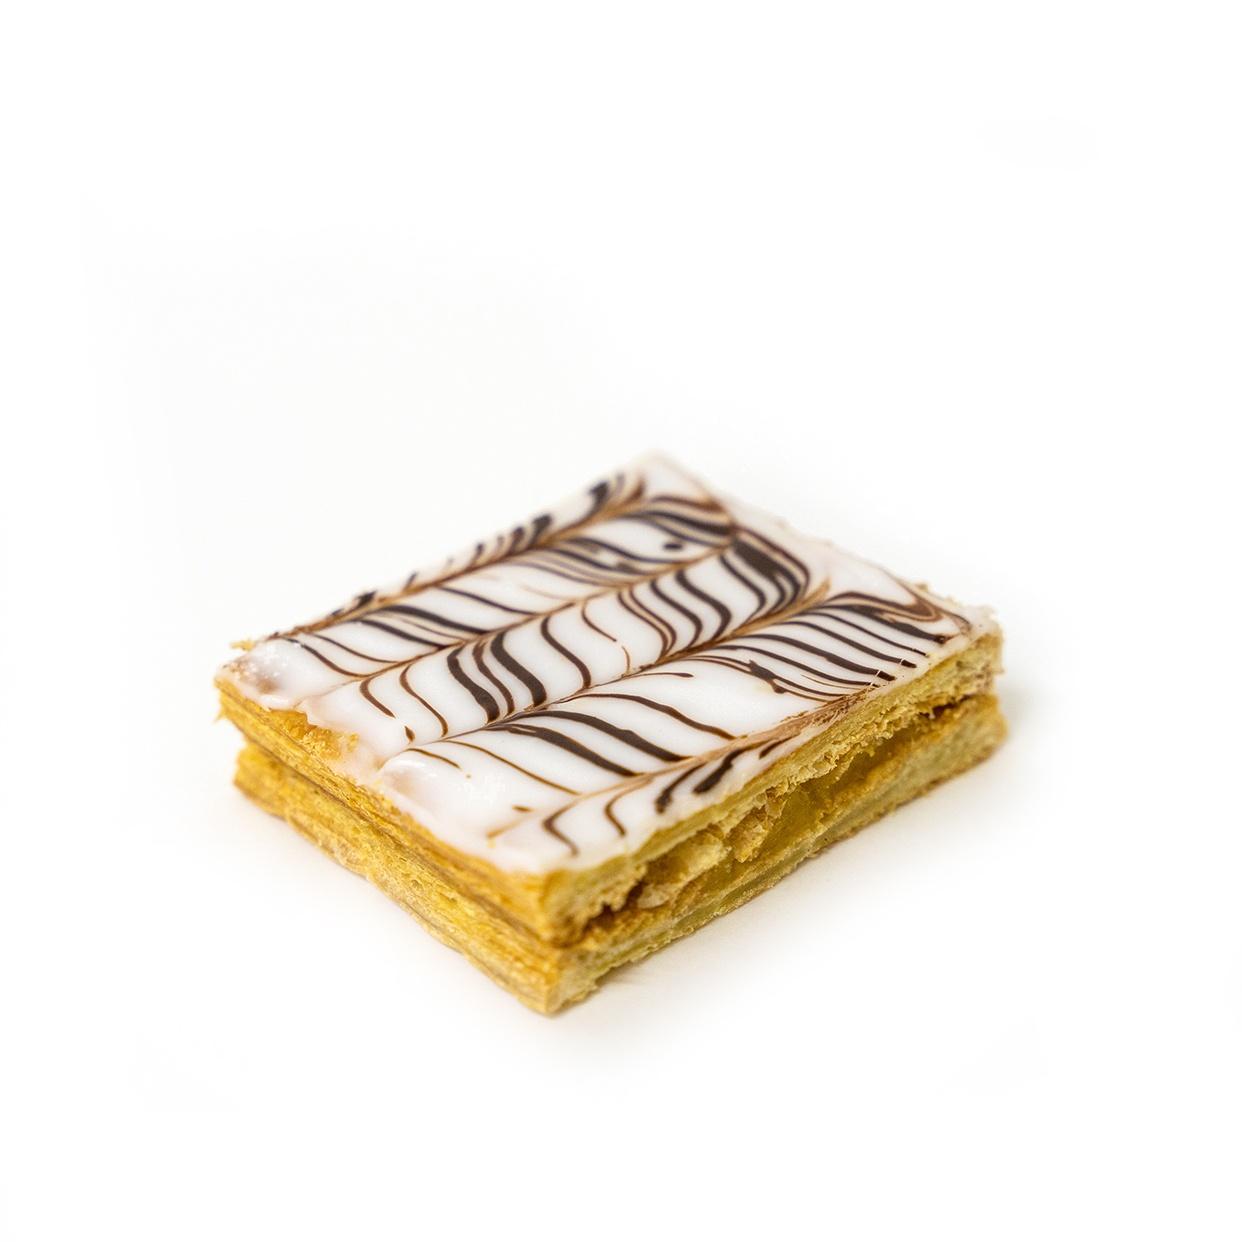 mil-folhas-pastelaria-fresca-entrega-casa-cale-confeitaria-tradicional-portuguesa-peniche-caldas-rainha-padaria-pastelaria